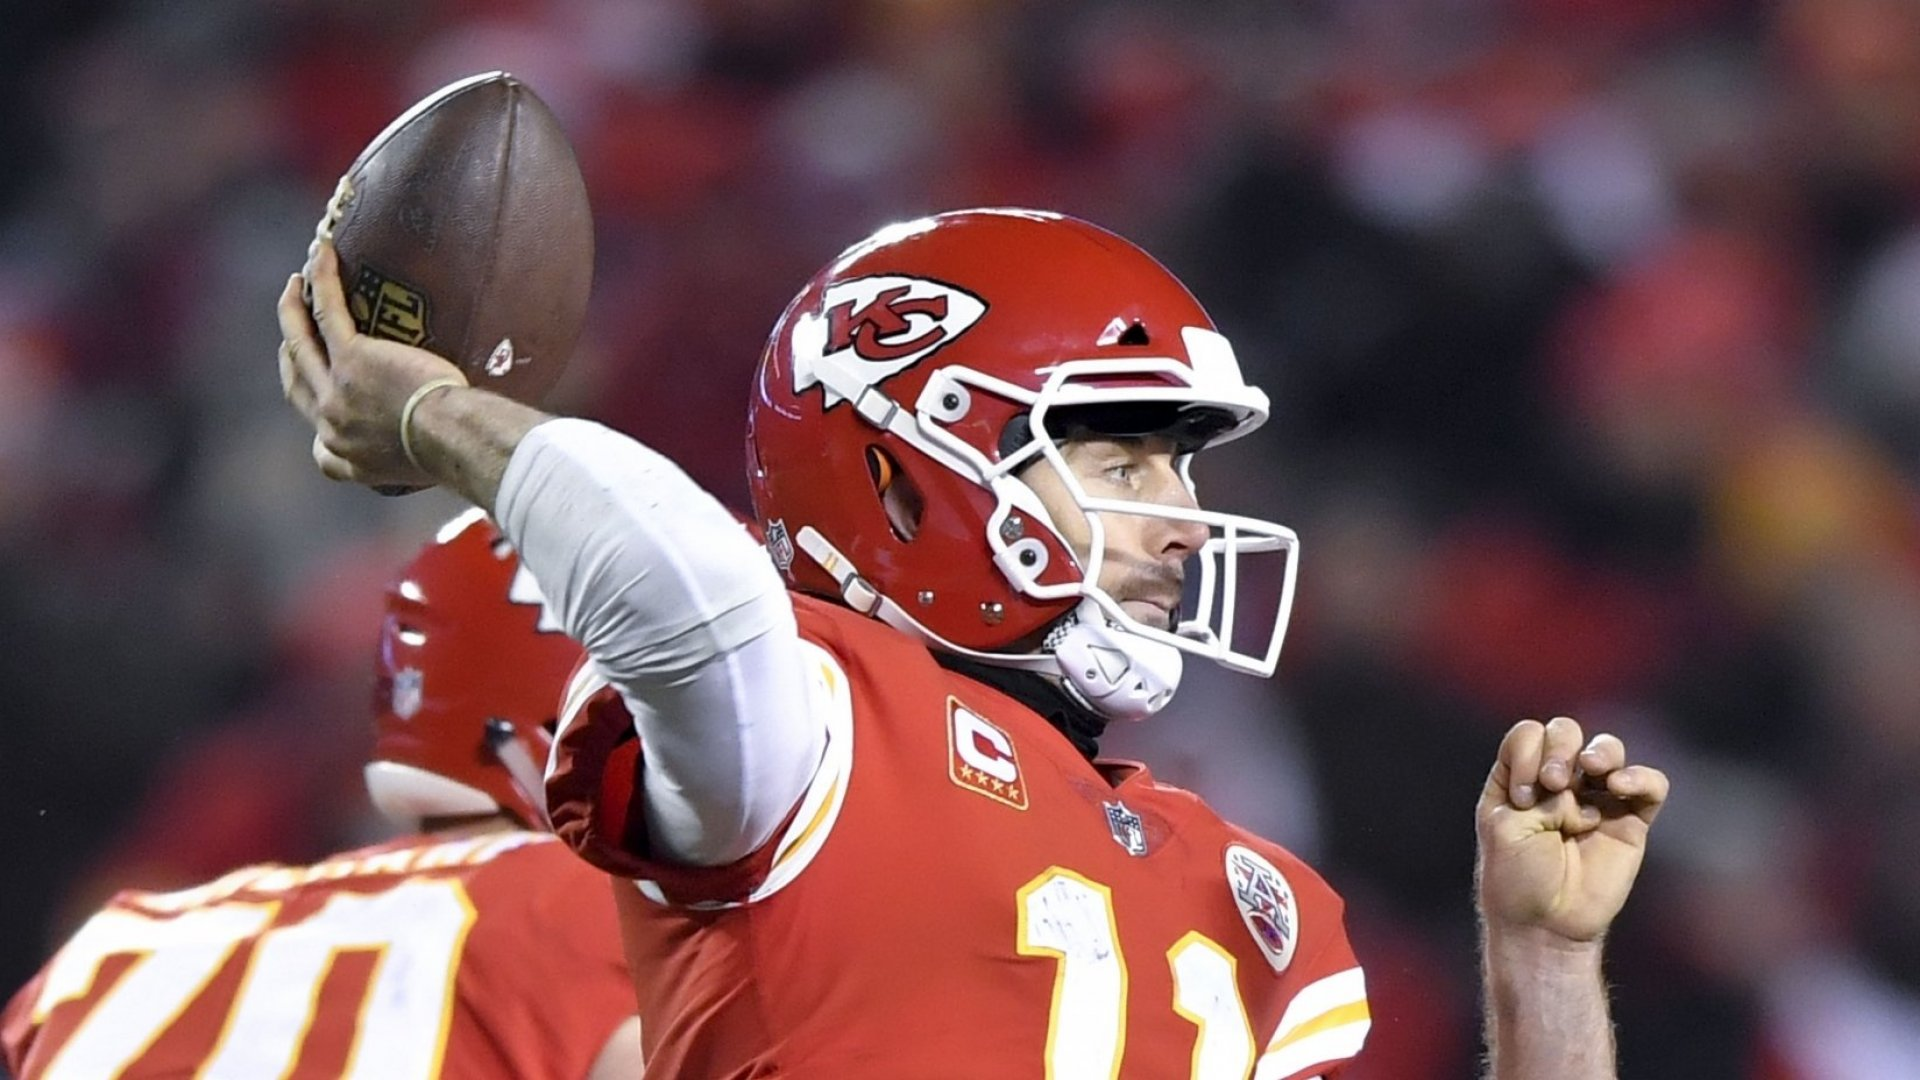 Kansas City Chiefs quarterback Alex Smith throws a pass during a playoff game while wearing Vicis's Zero1 helmet.